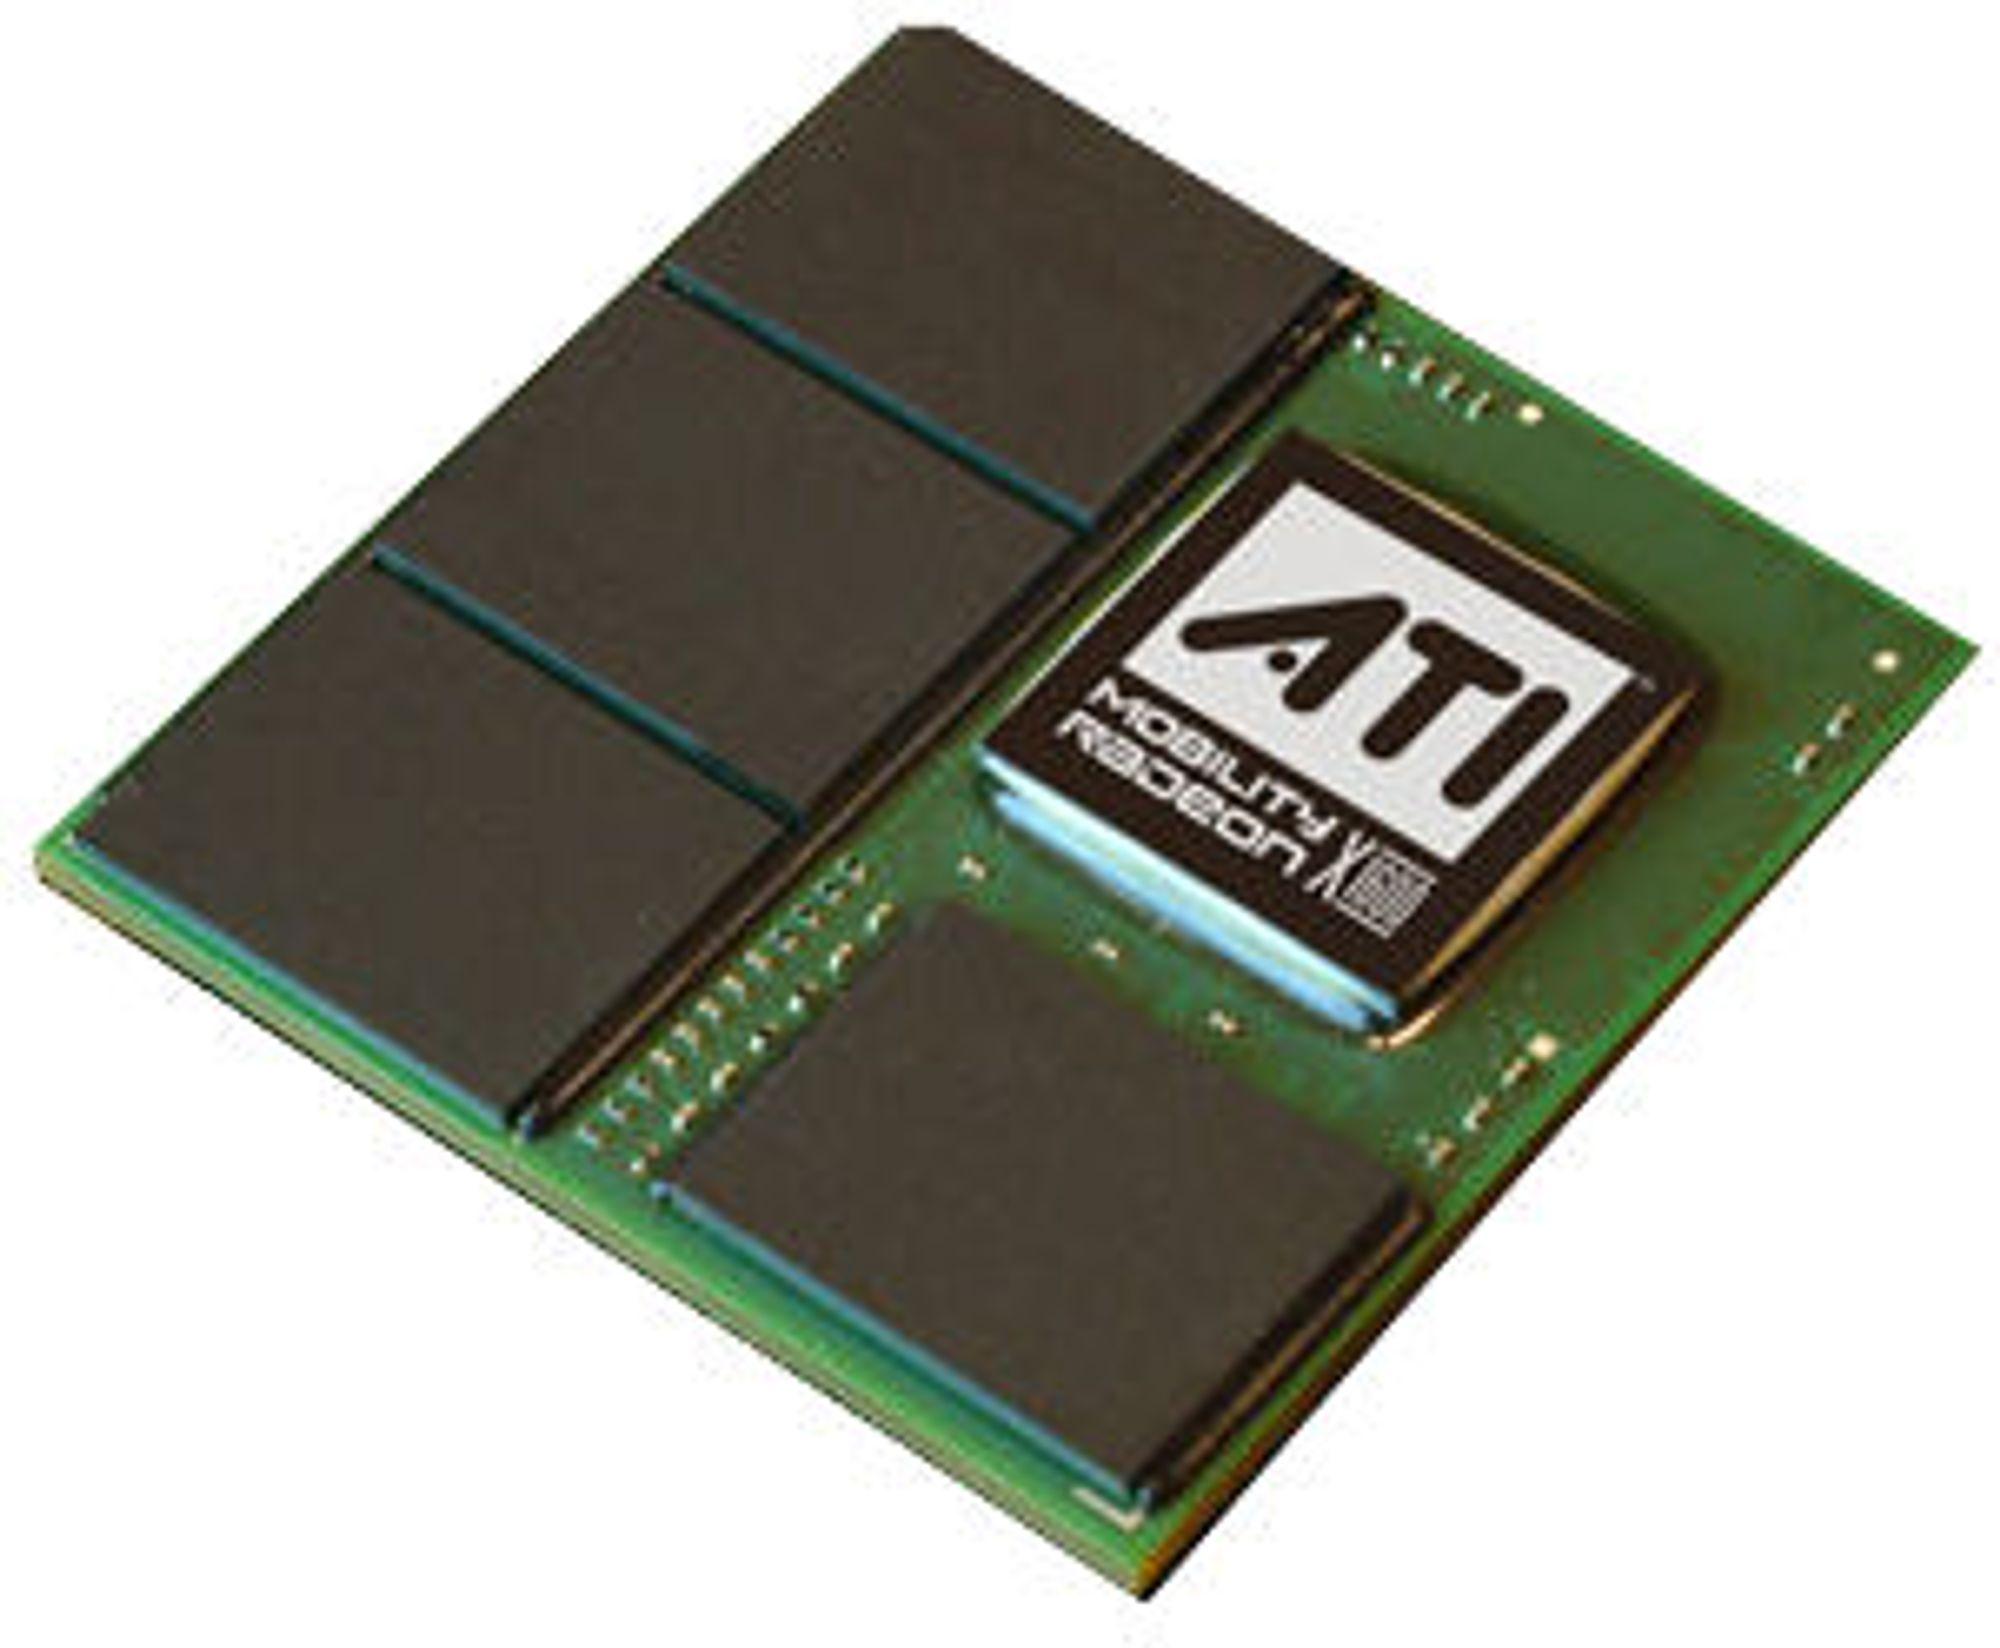 Bildet viser AMD/ATI Mobility Radeon X1600